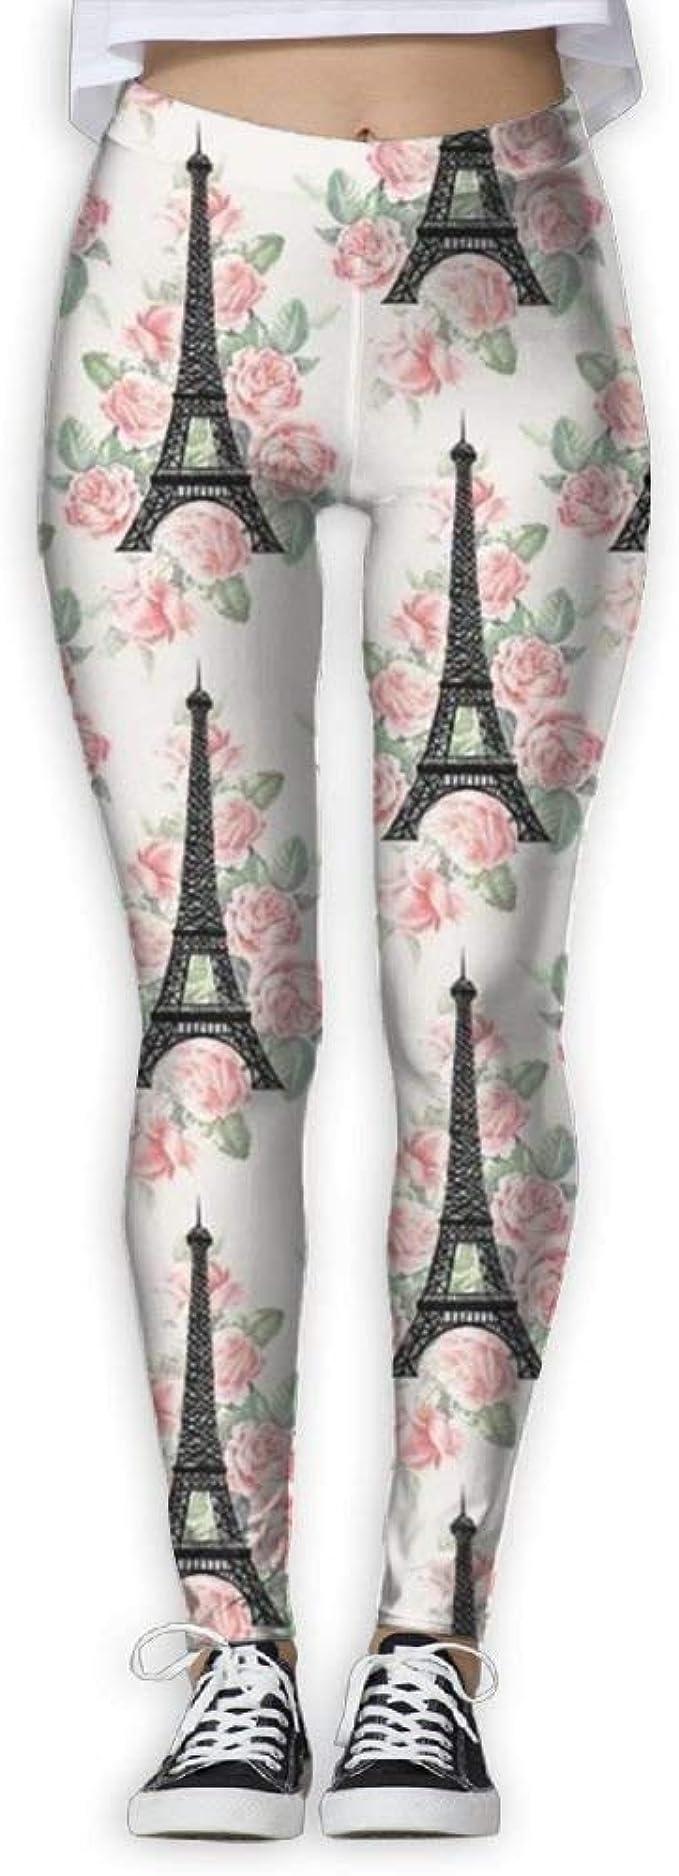 QQMIMIG Printed Leggings Eiffel Tower Leggings Workout Leggings Women Girls